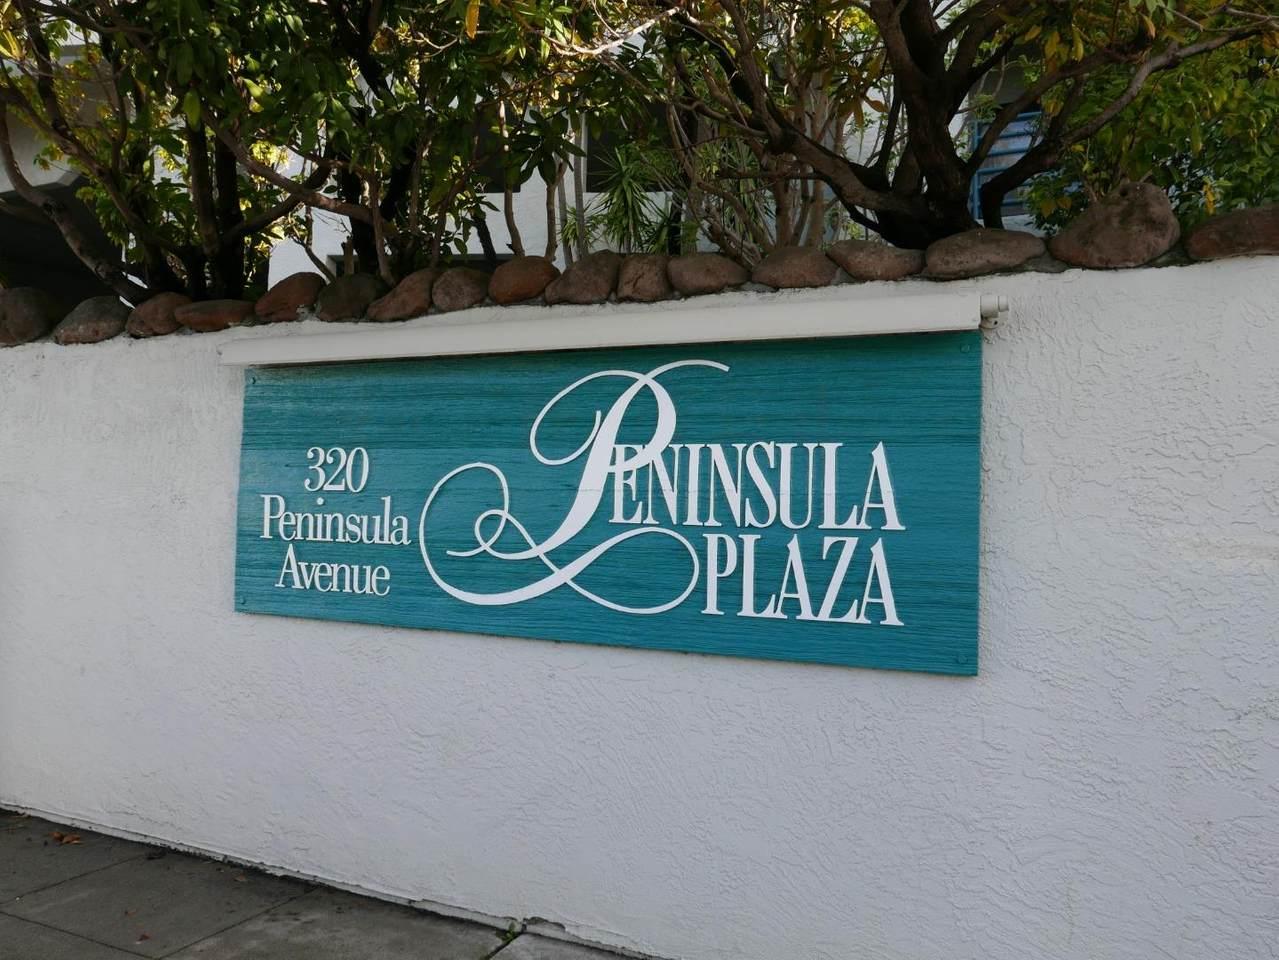 320 Peninsula Ave 215 - Photo 1